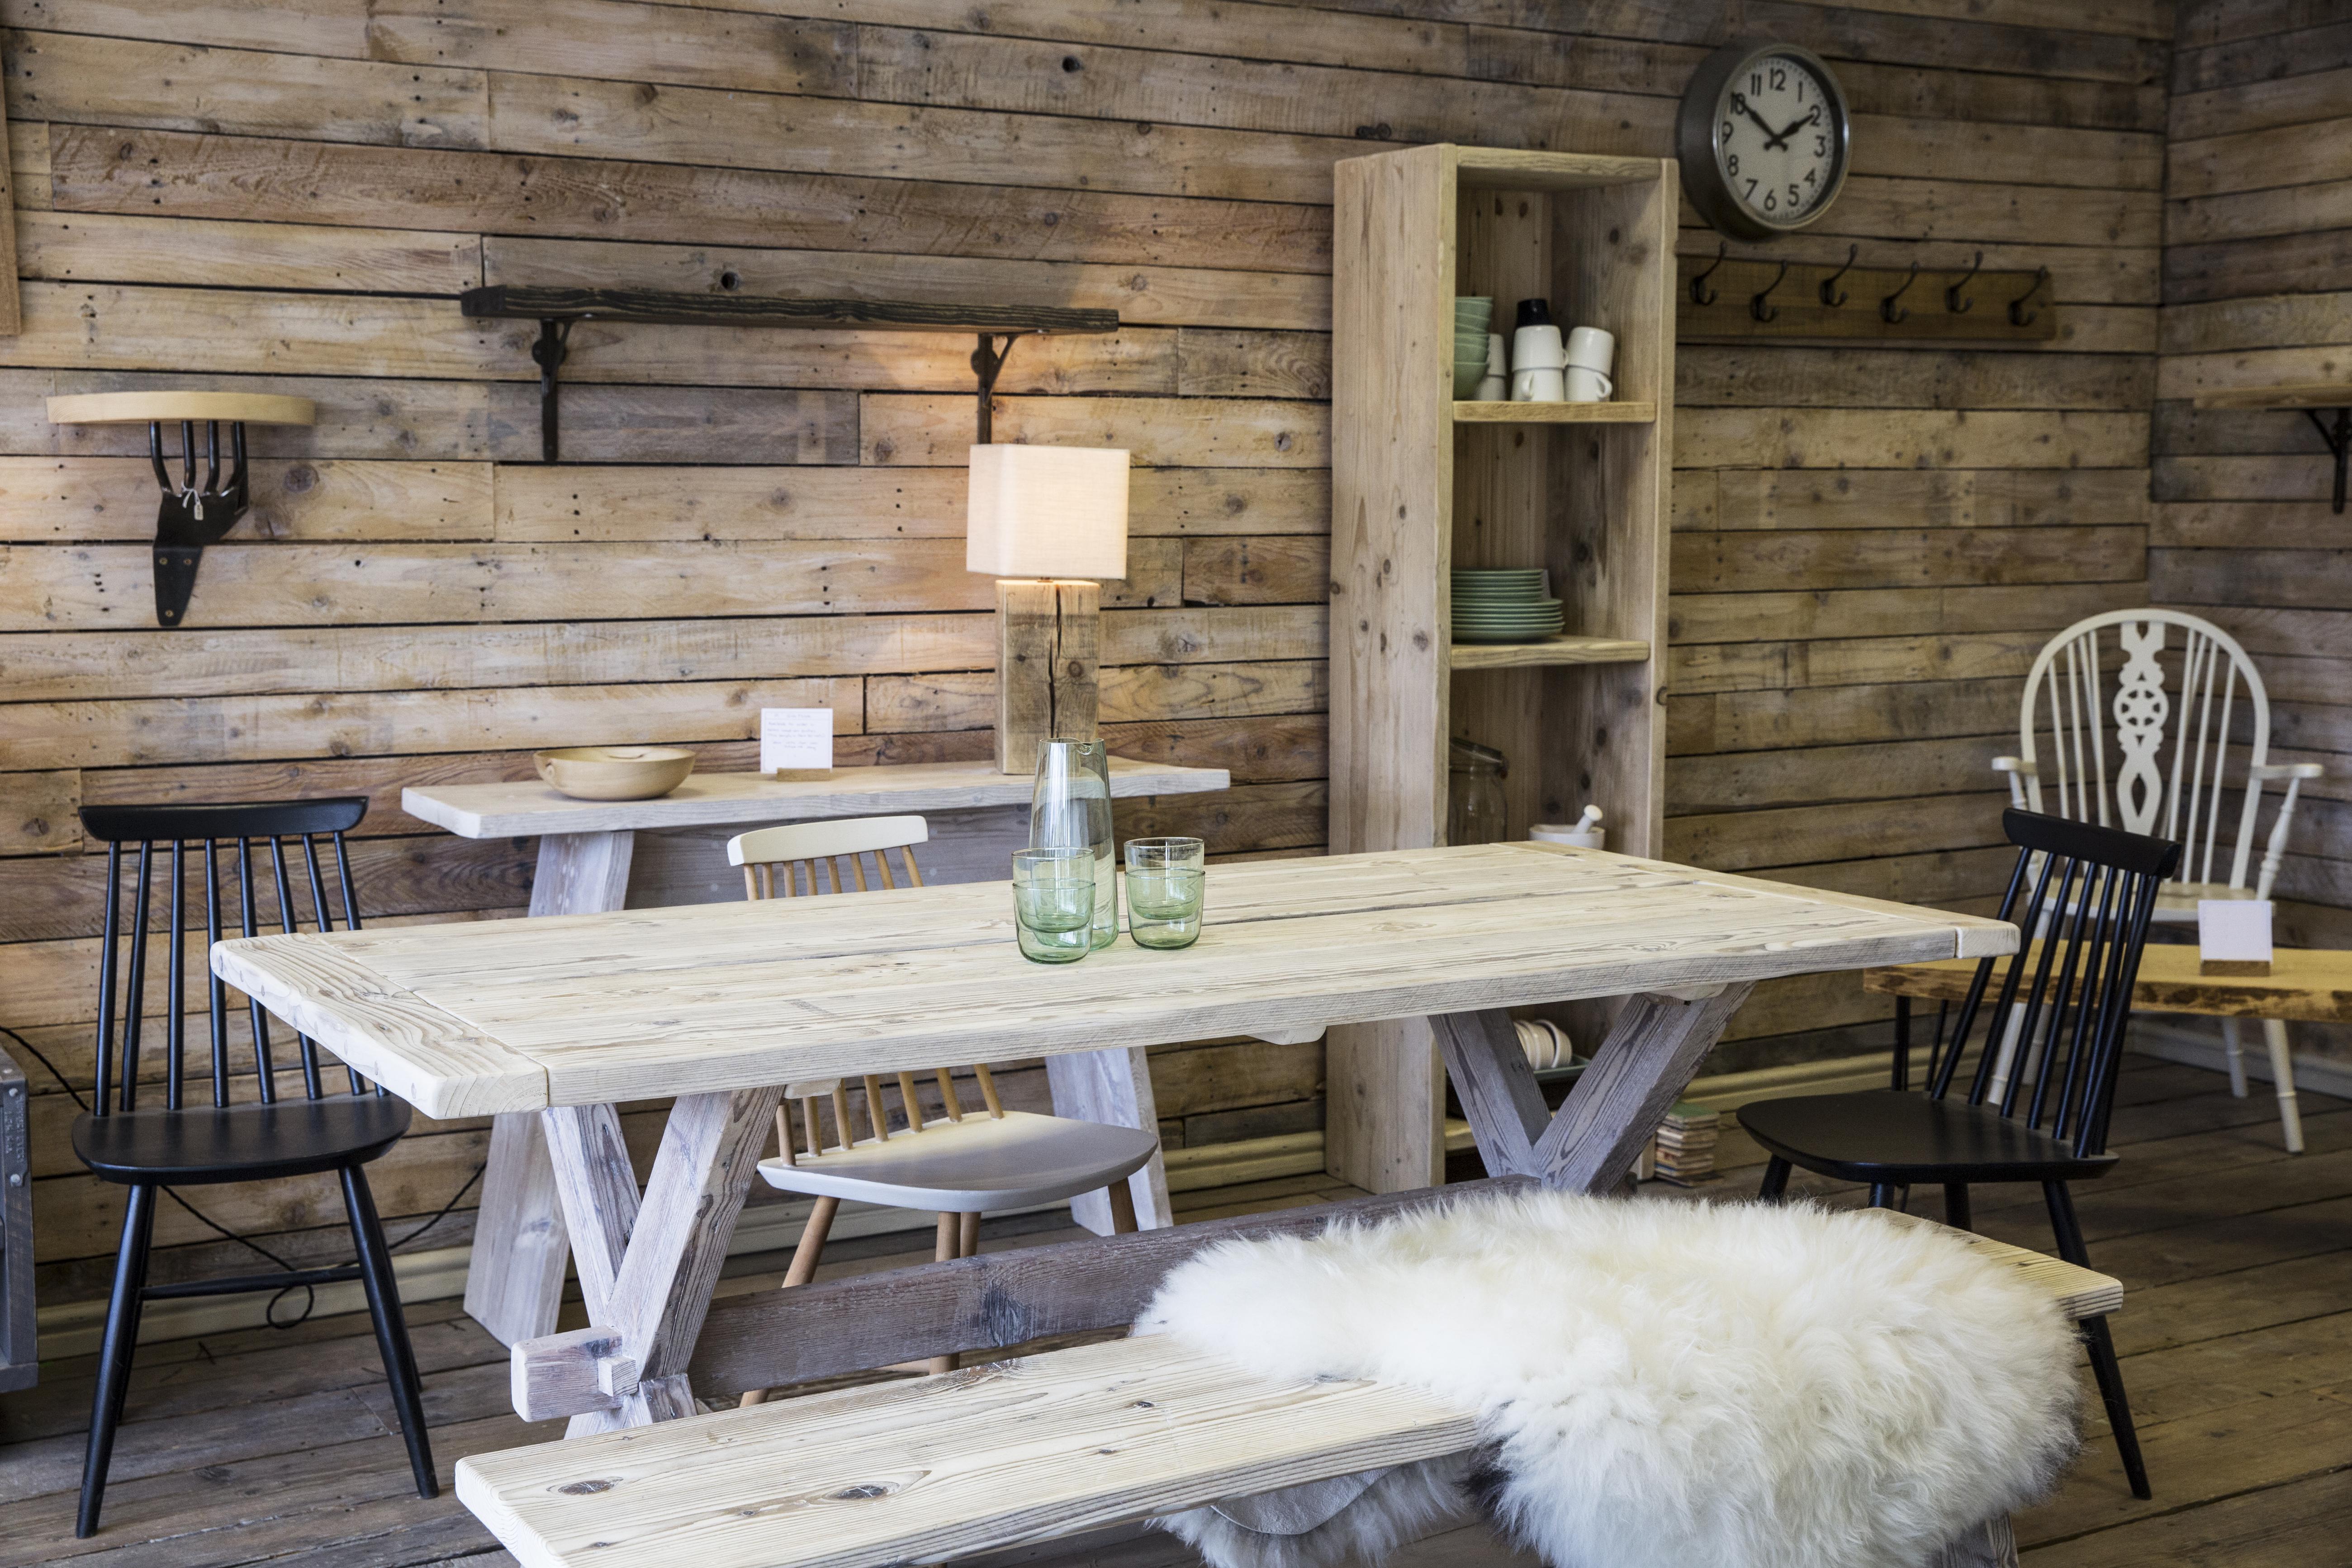 display-of-furniture-made-from-recycled-wood-inclu-u6w54hc.jpg